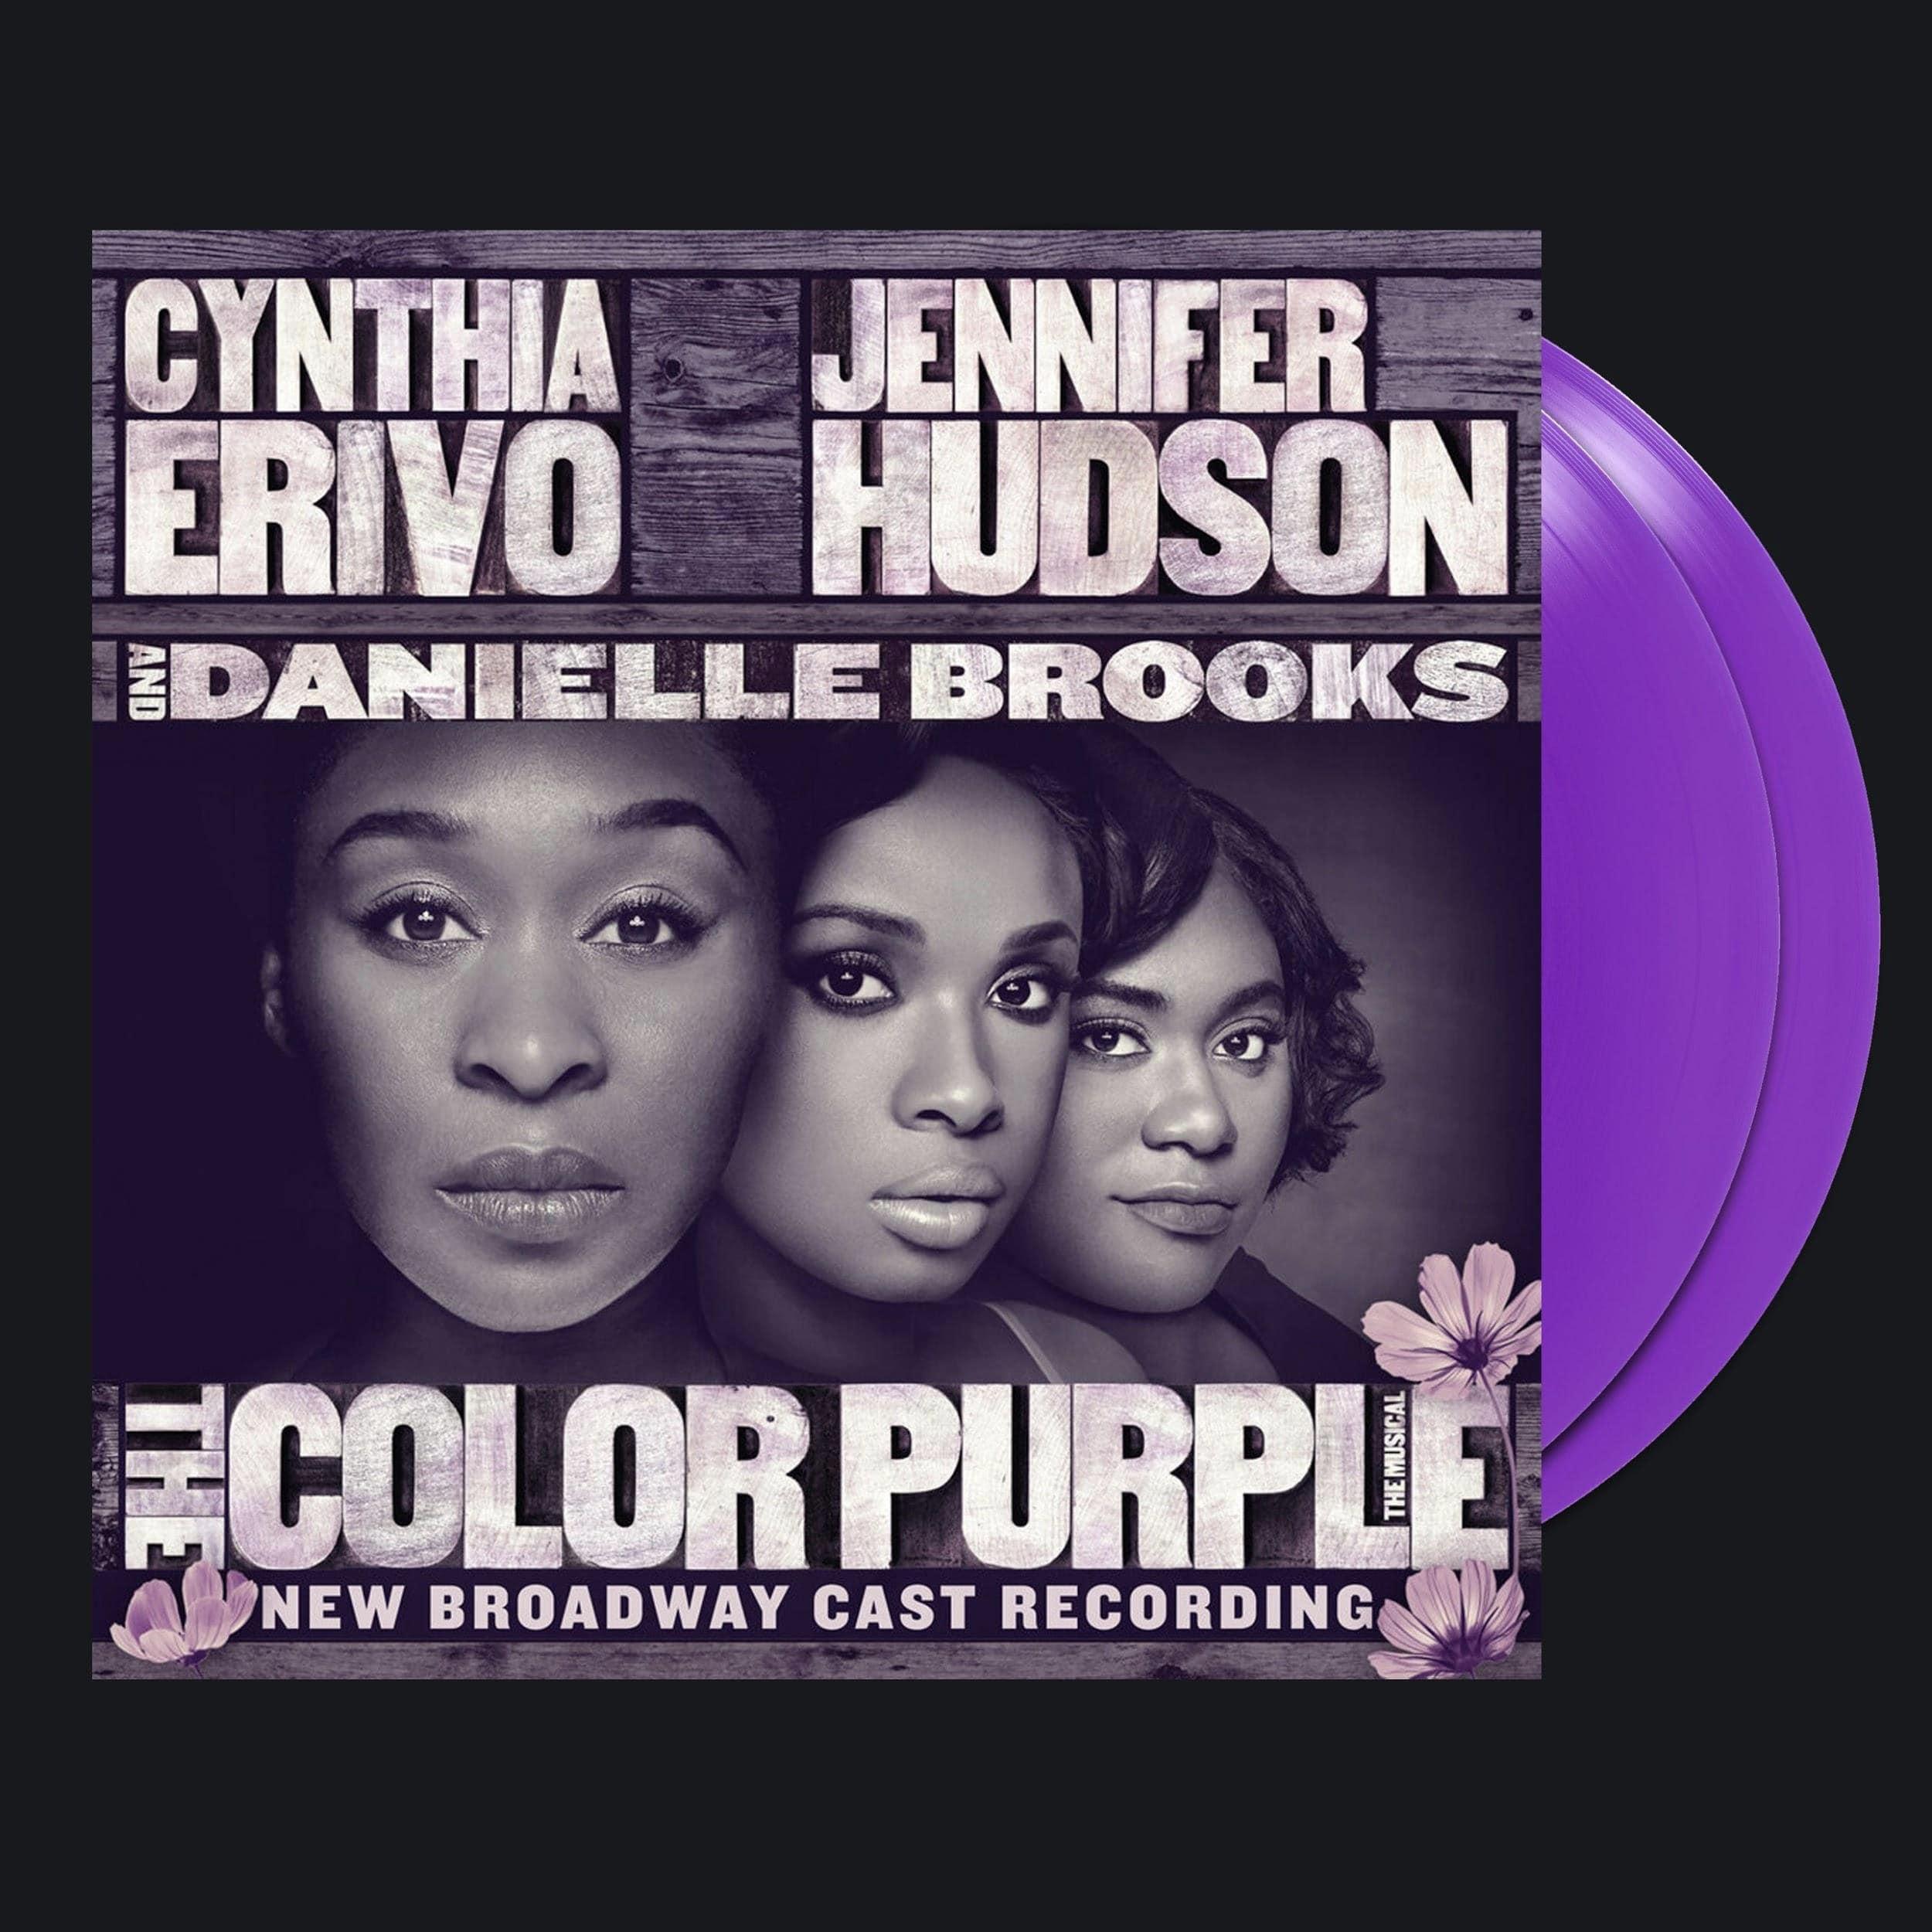 The Color Purple Vinyl Album